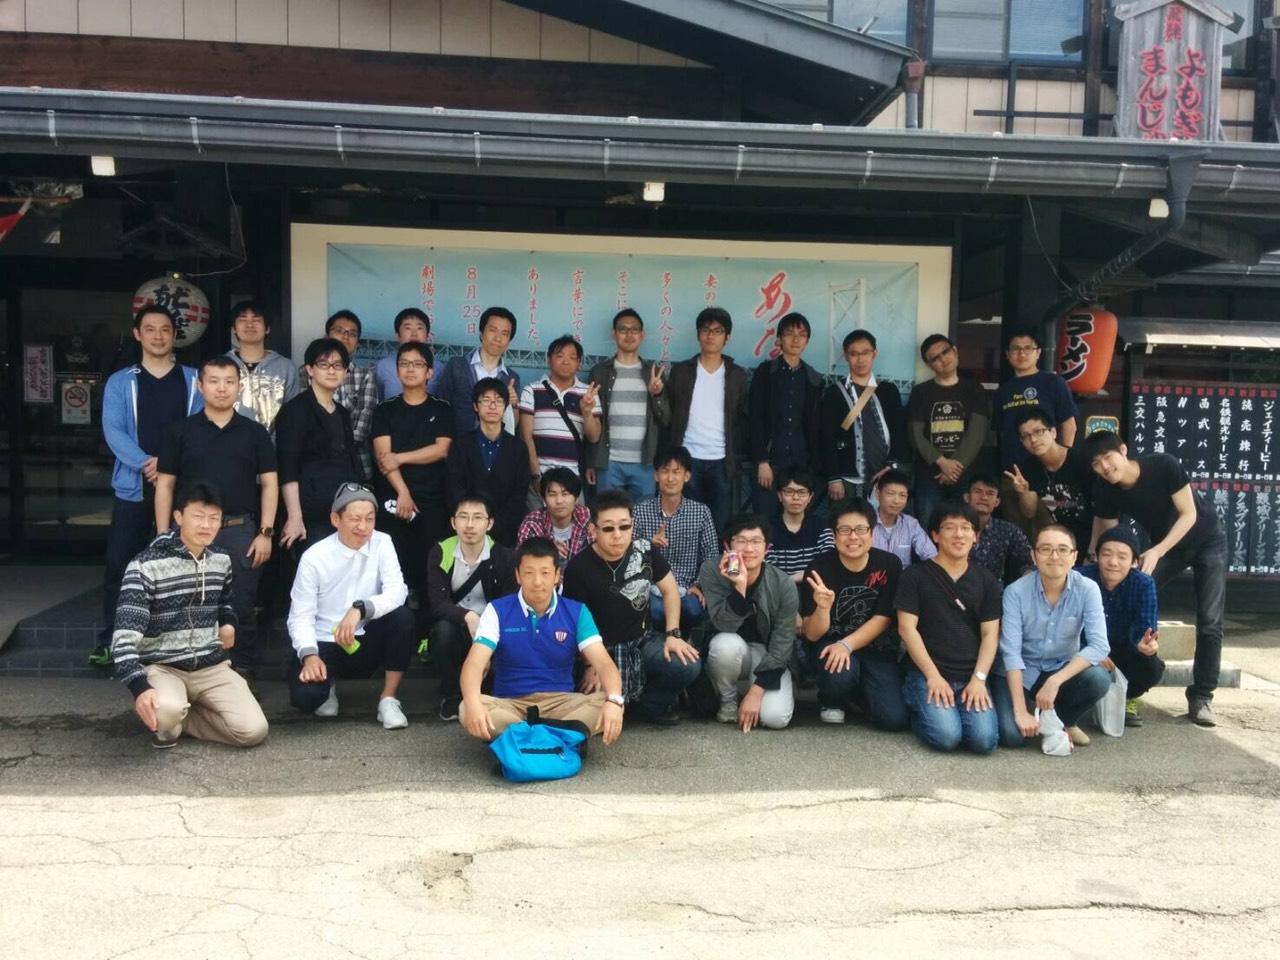 2016大阪オフィス社員旅行 in 岐阜_e0206865_23325796.jpg